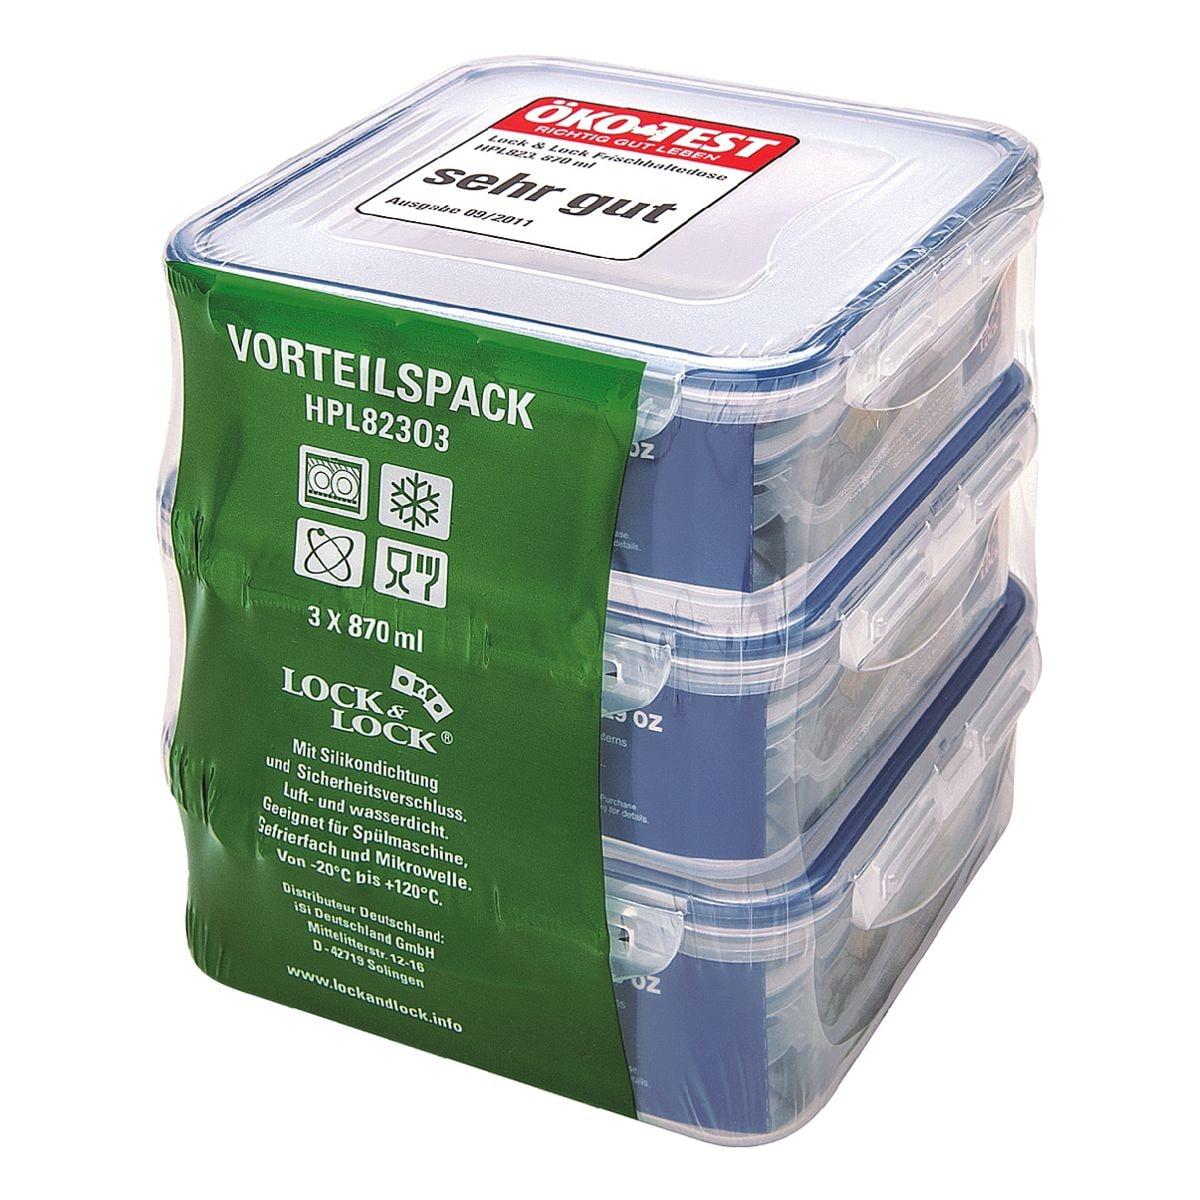 Lock & Lock Lot de 3 boîtes alimentaires « HPL82303 » (3x 870 ml)